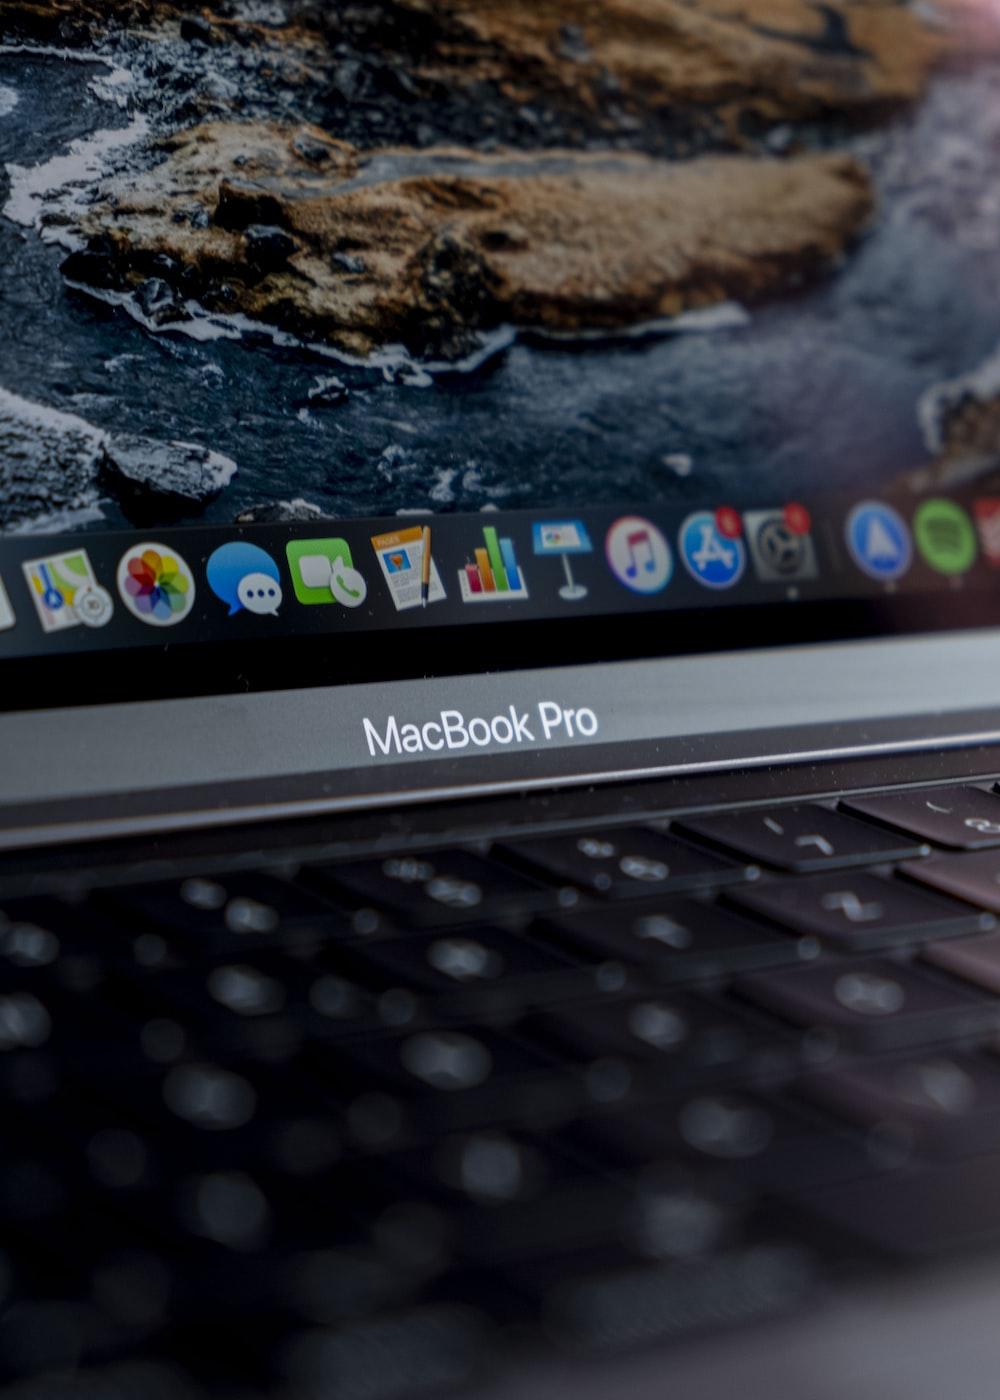 macbook pro displaying white and black rocks